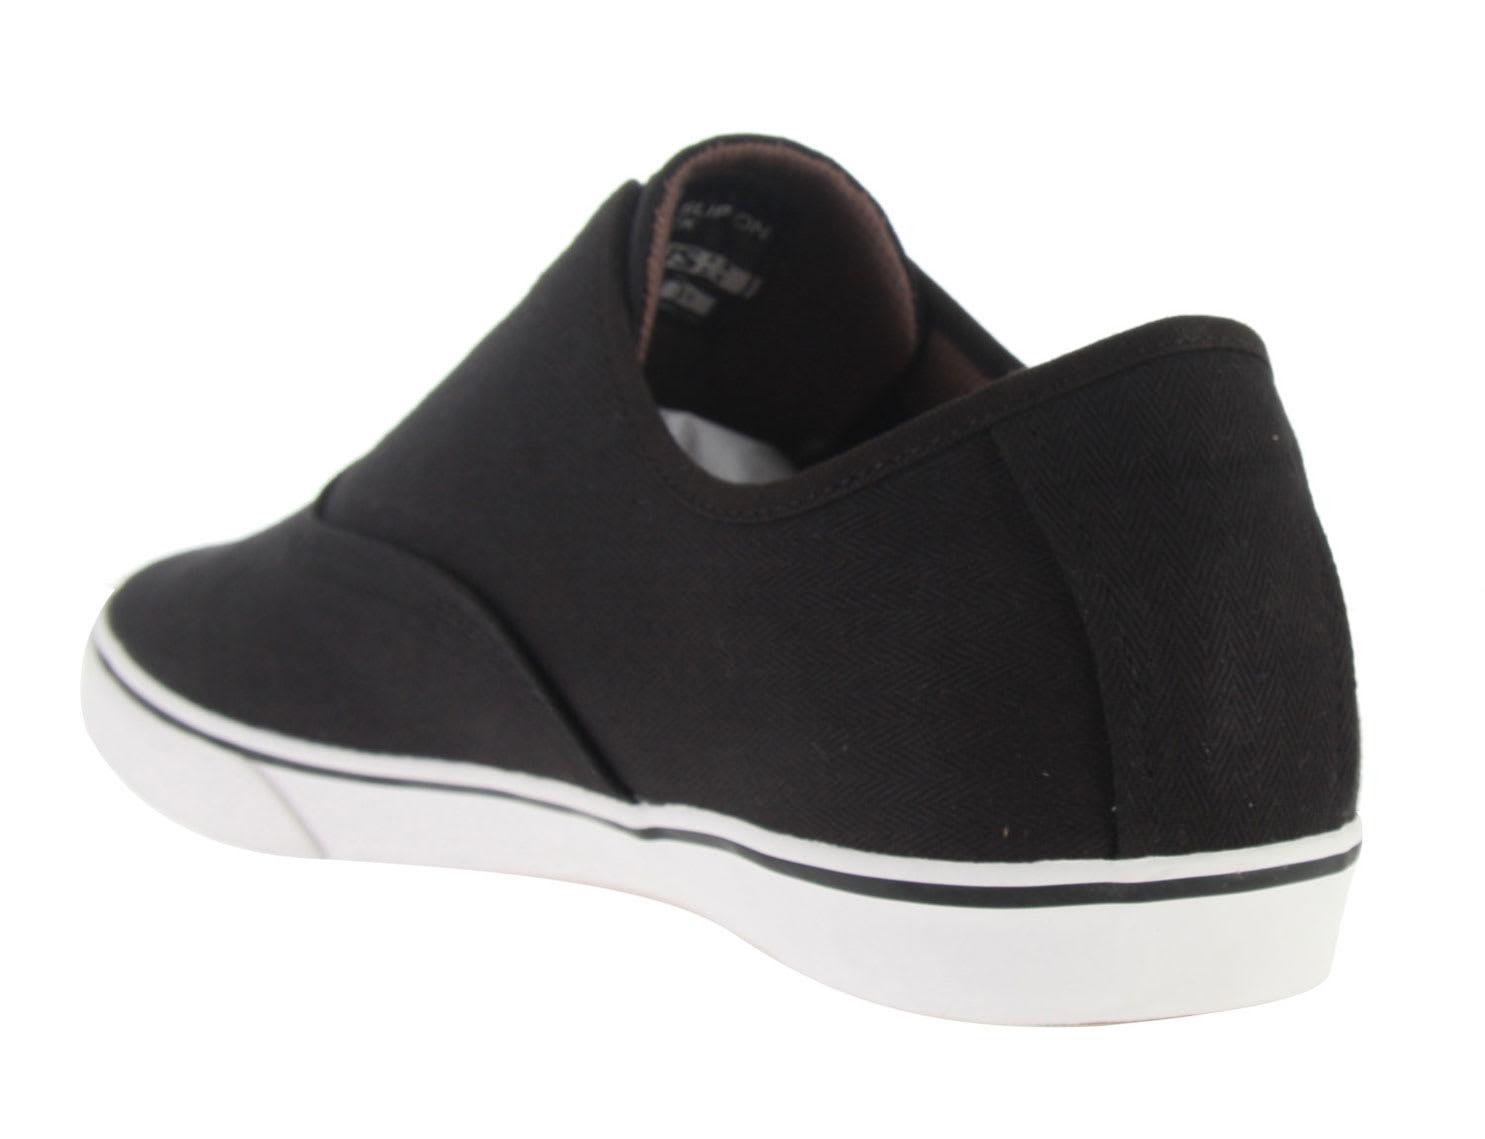 911053a43bc9dc Gravis Dylan Slip On Shoes - thumbnail 3